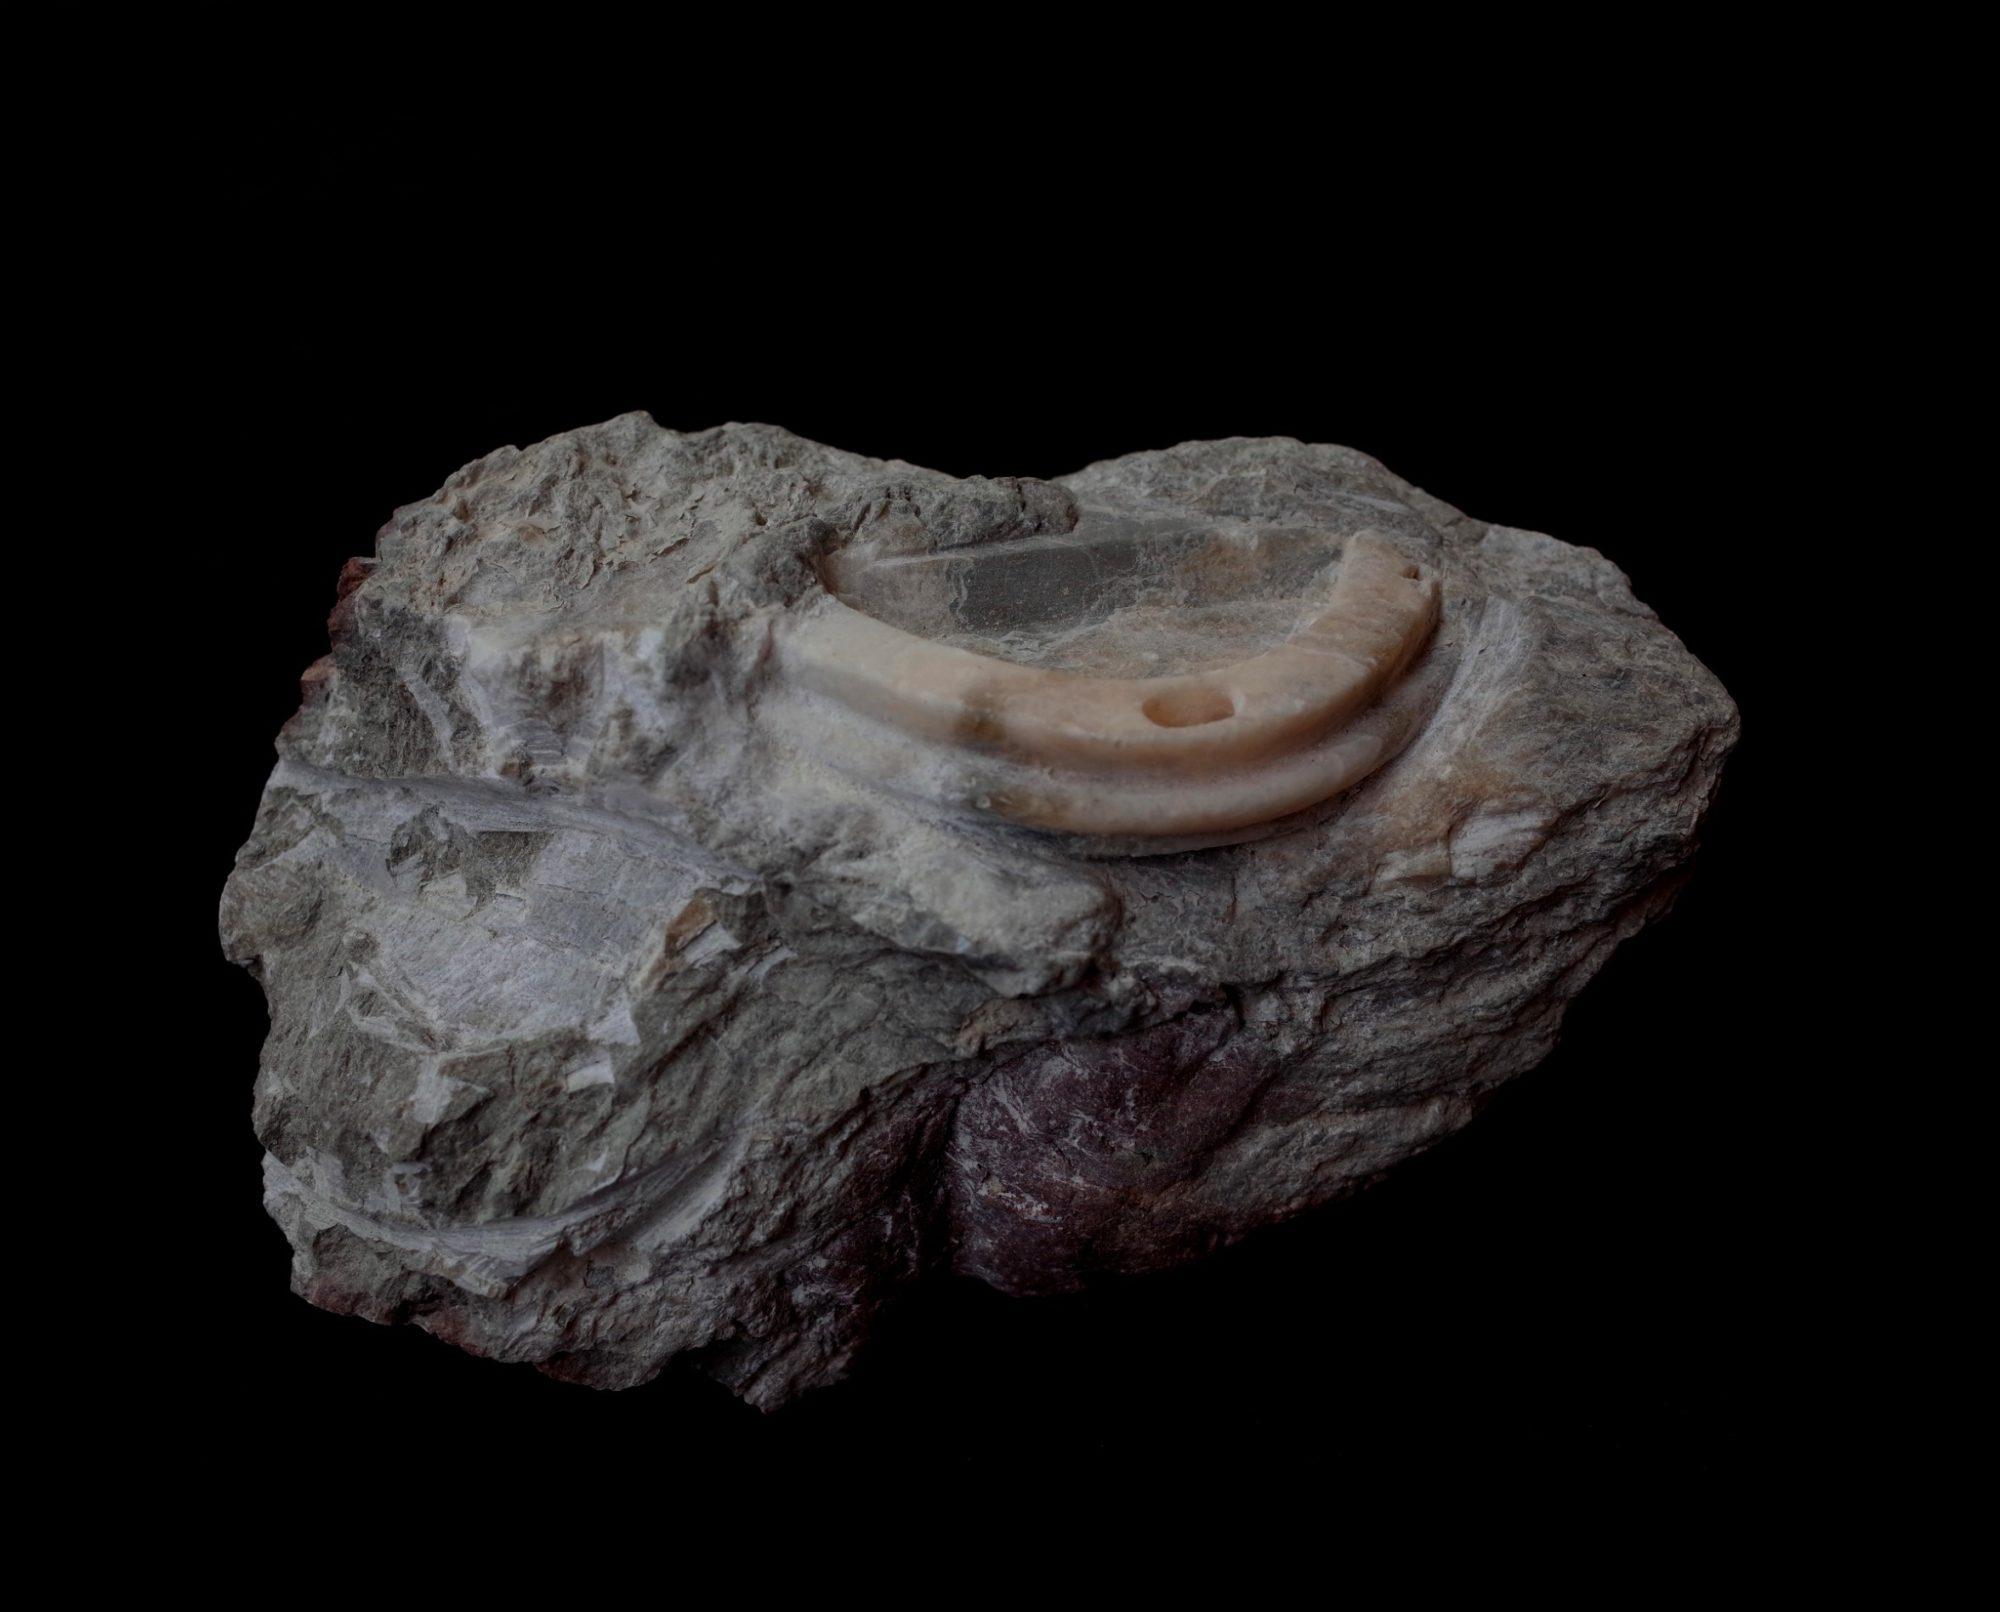 Anthropocene fossil no.1 image